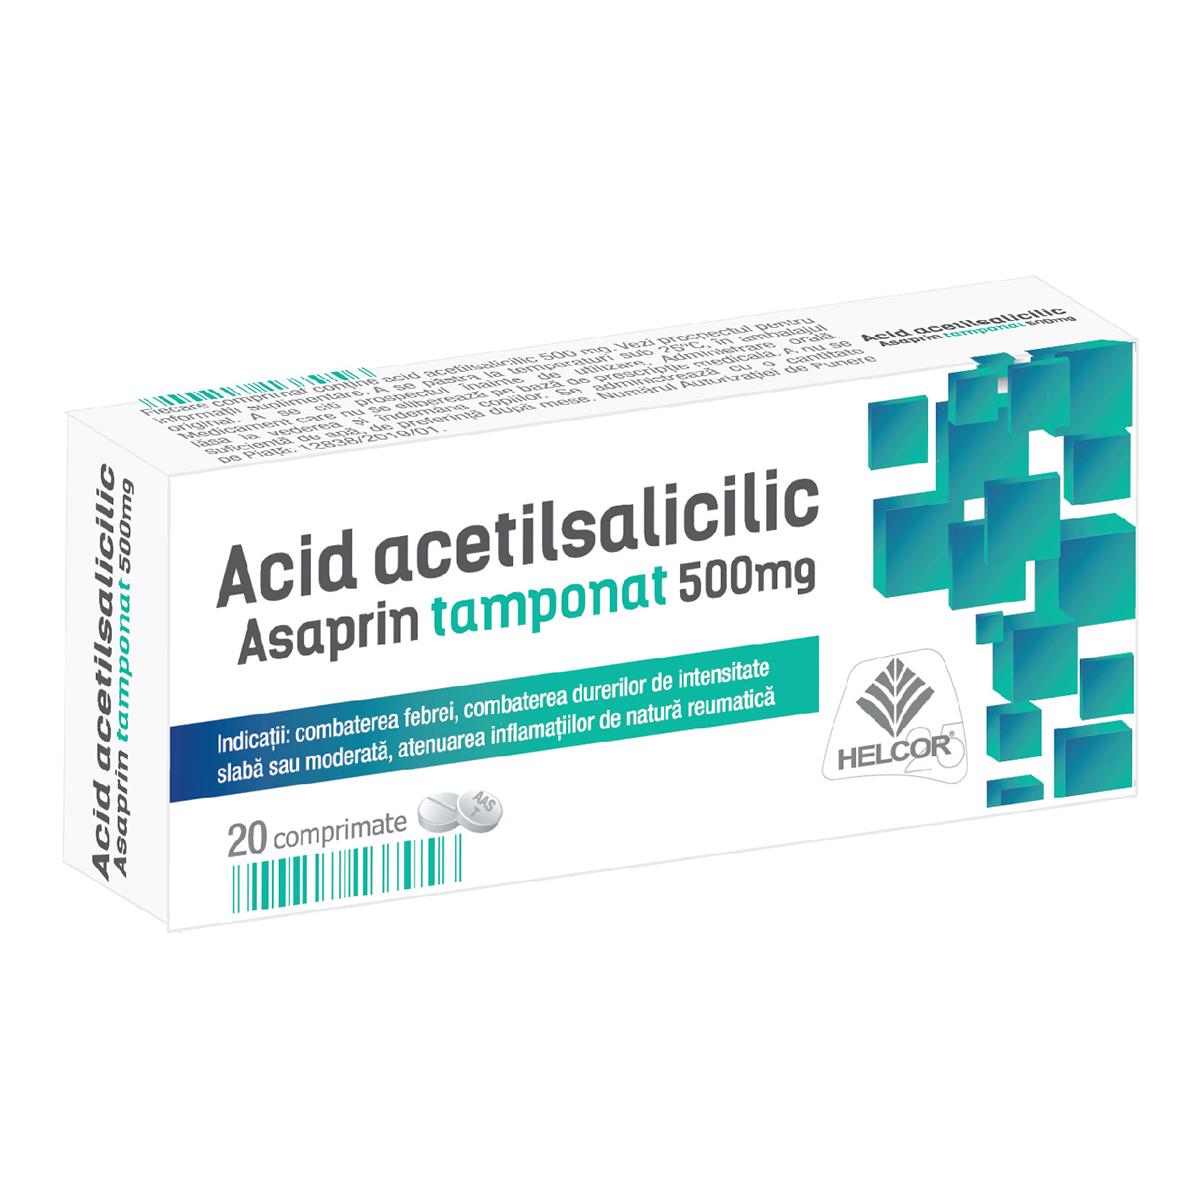 Asaprin tamponat acid acetilsalicilic, 20 comprimate, Helcor